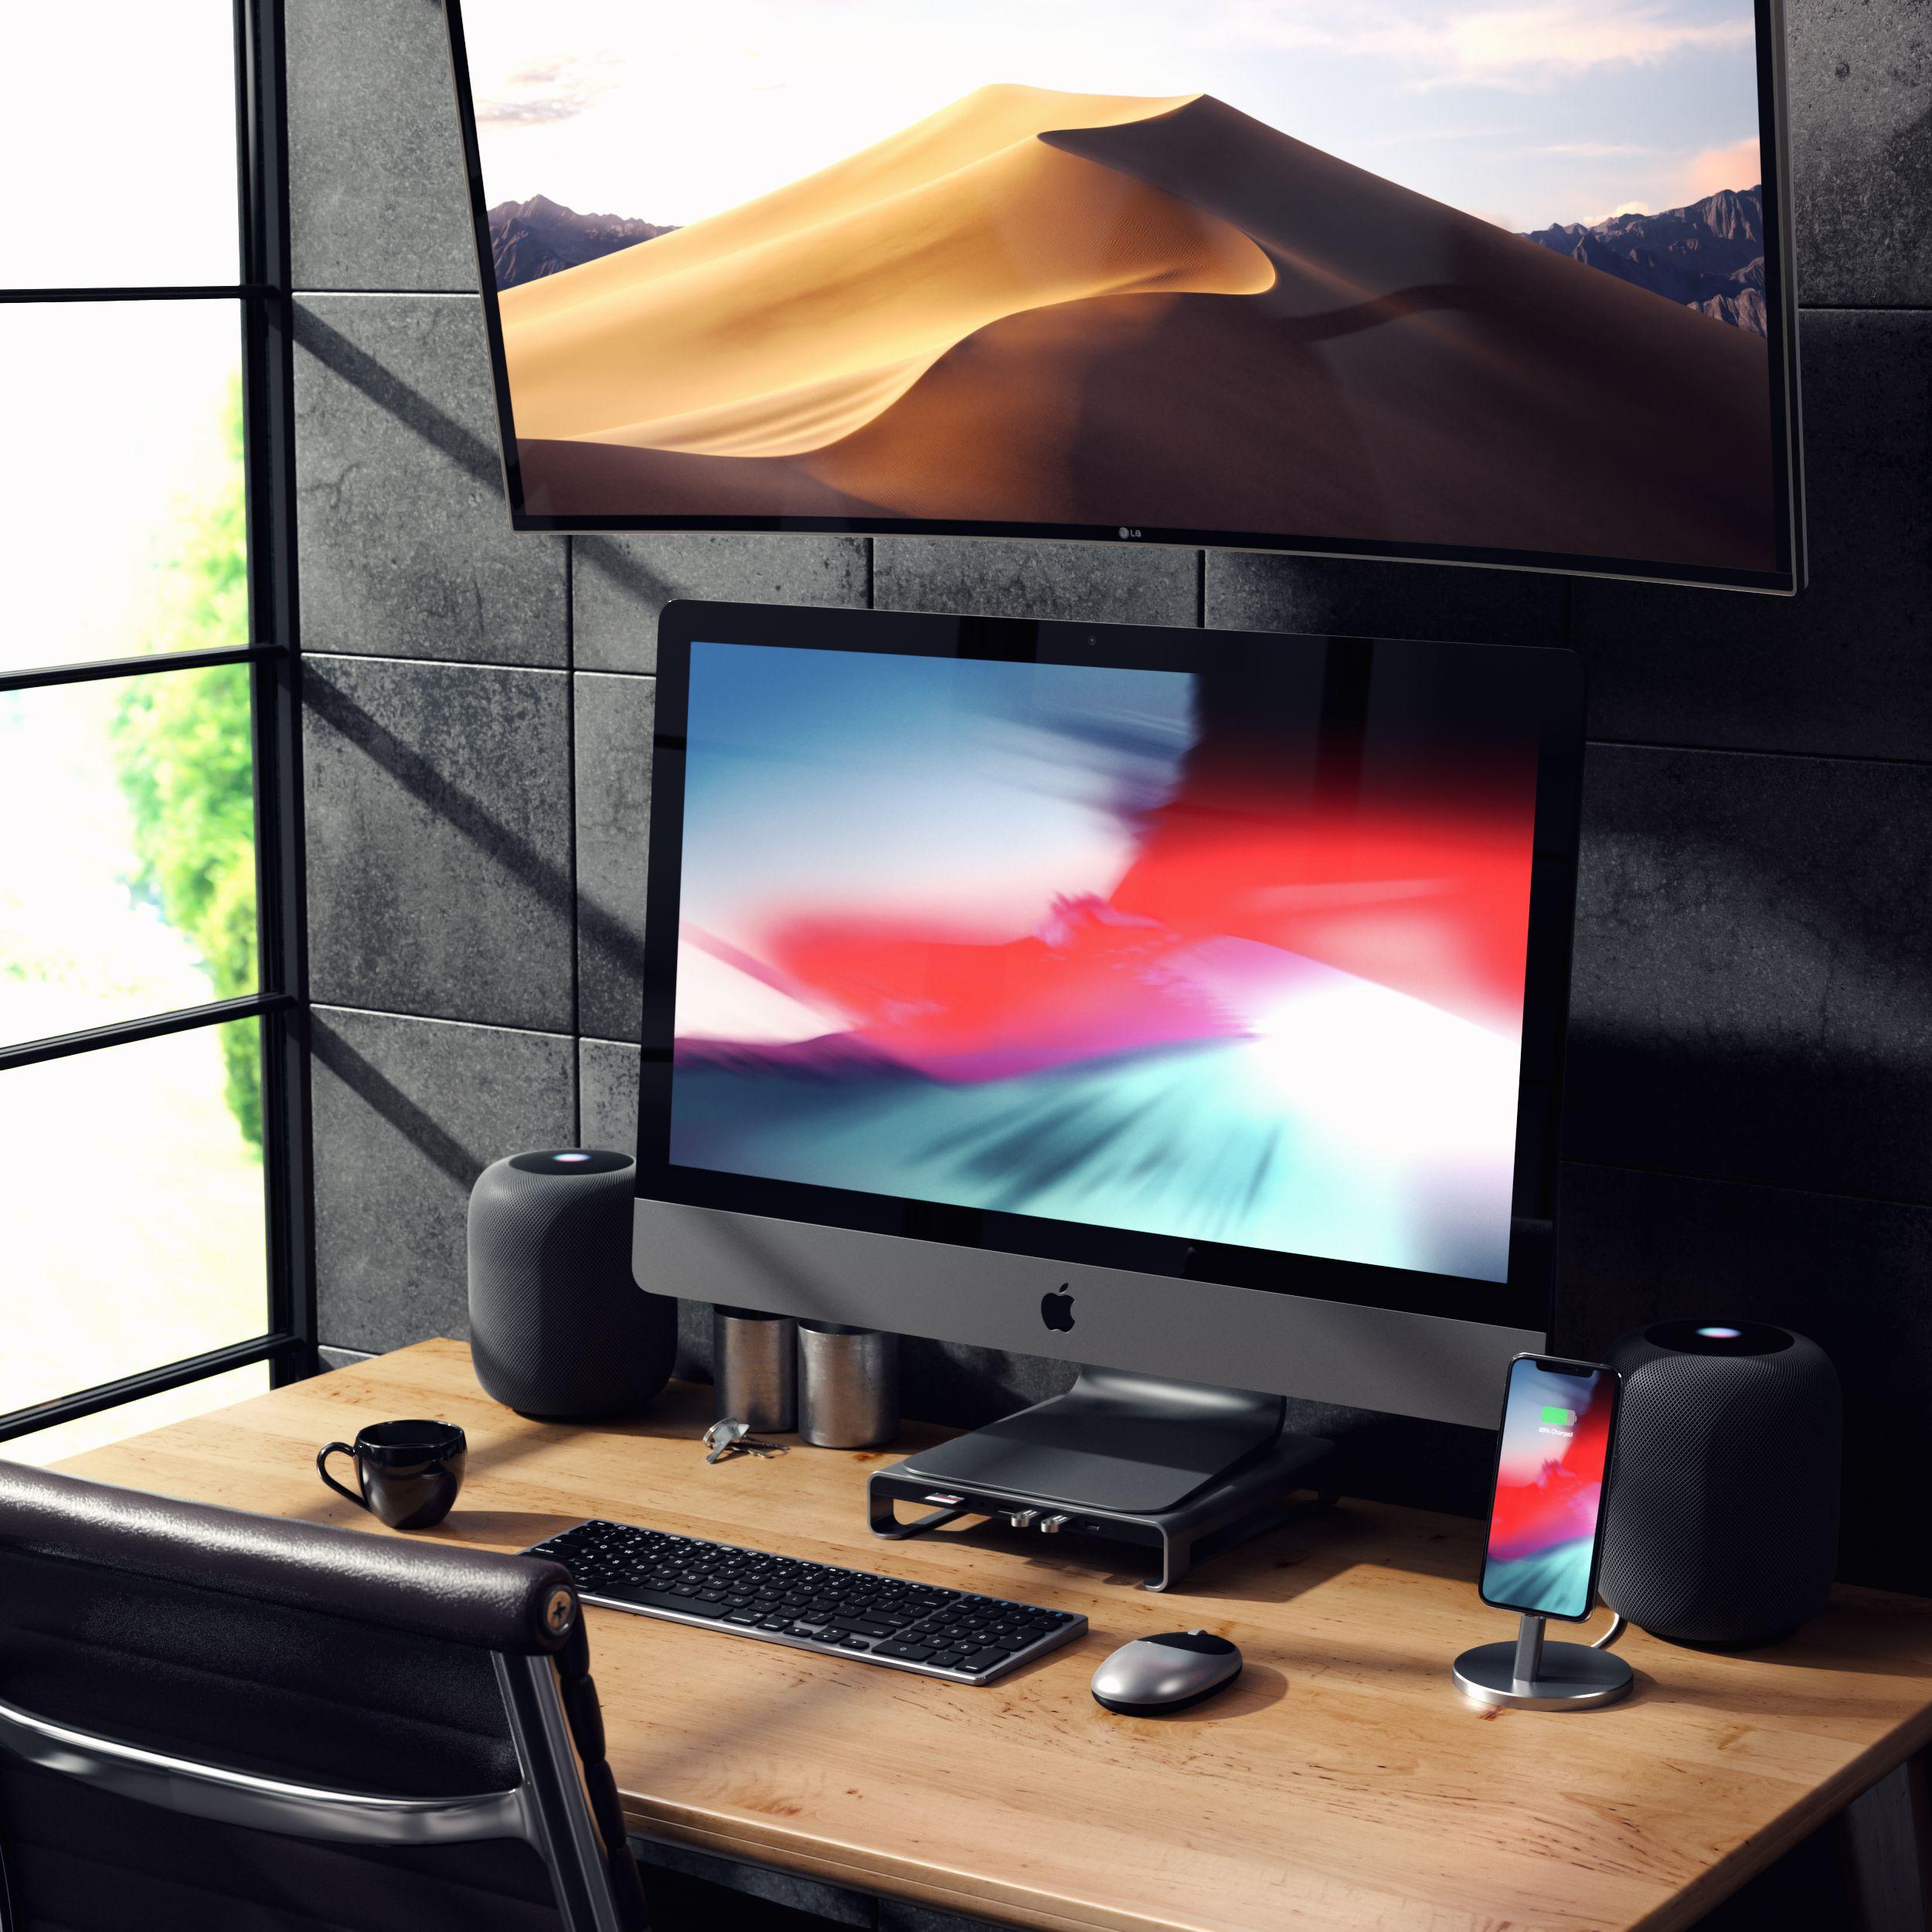 Best Homeoffice Desk: Pin By Satechi On Desk Set-Ups